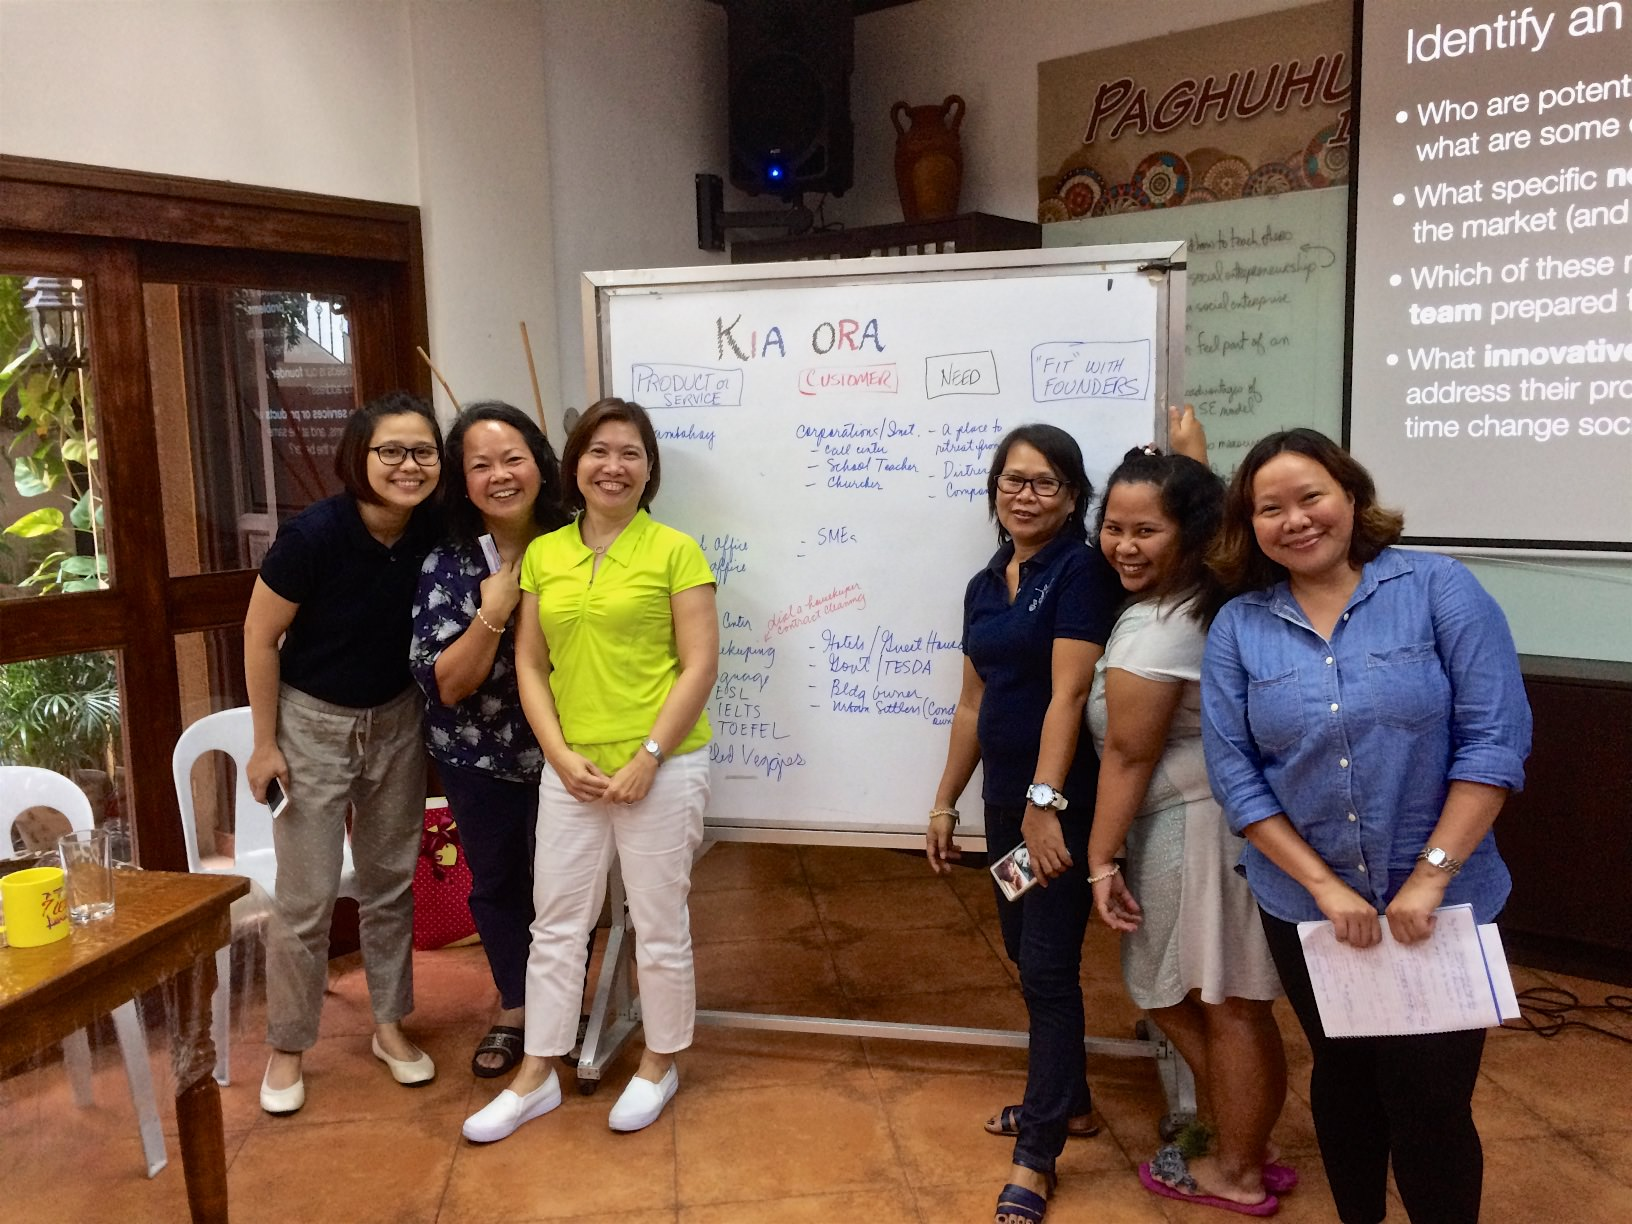 Samaritana staff presenting one of their social enterprise business plans